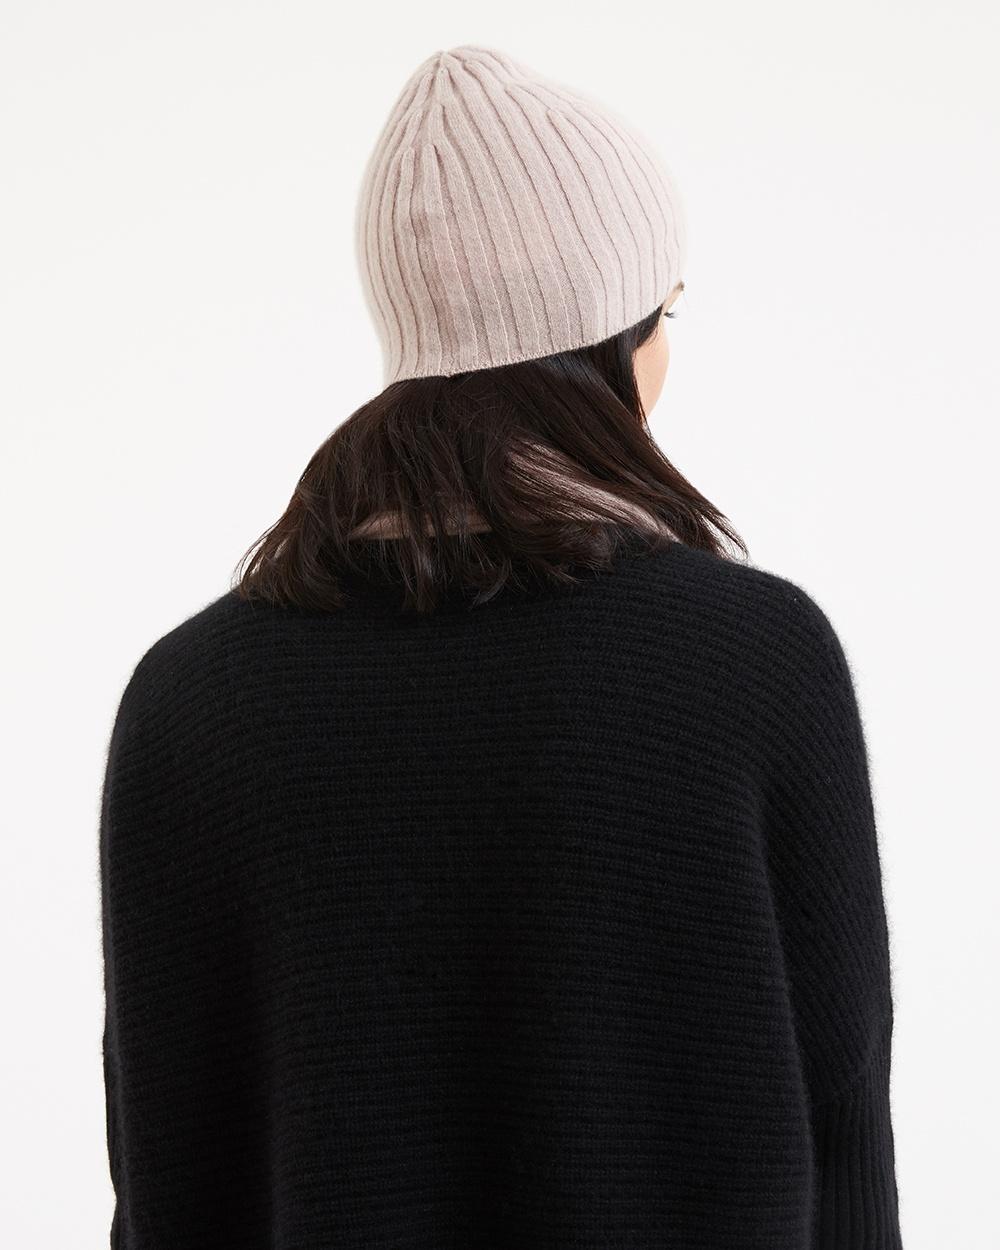 34ed6e874bb Trouva  Hats